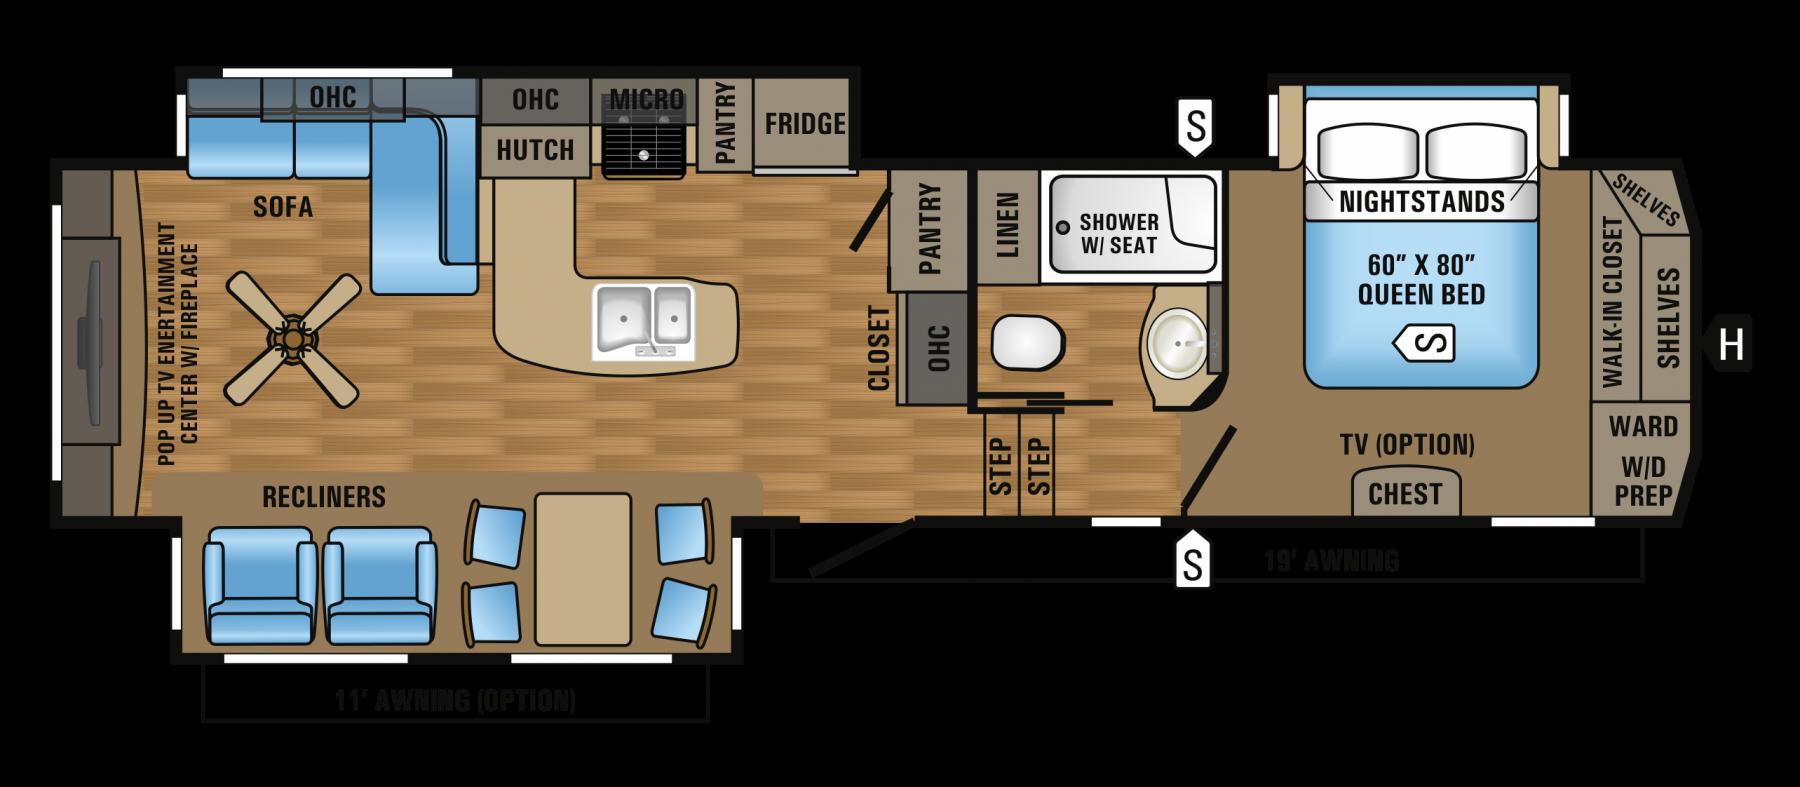 327CKTS Floorplan